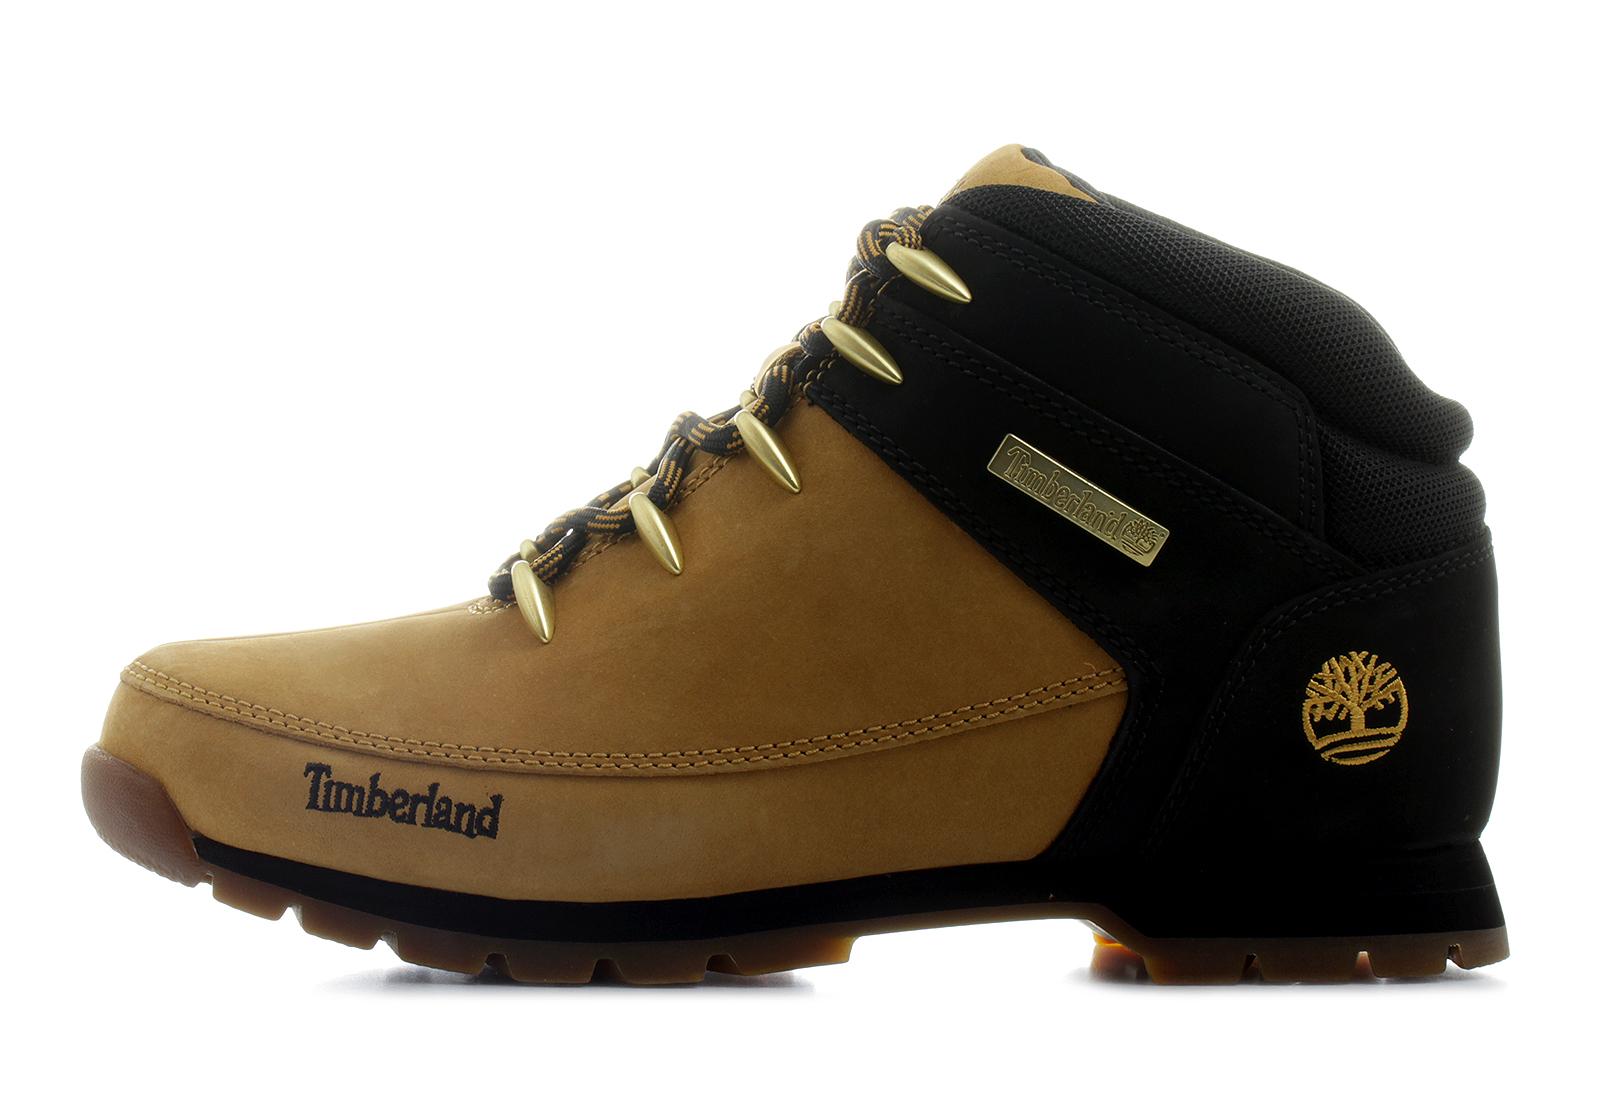 dbea7f6db09b1 Timberland Buty Zimowe - Euro Sprint Hiker - a1nhj-whe - Obuwie i ...